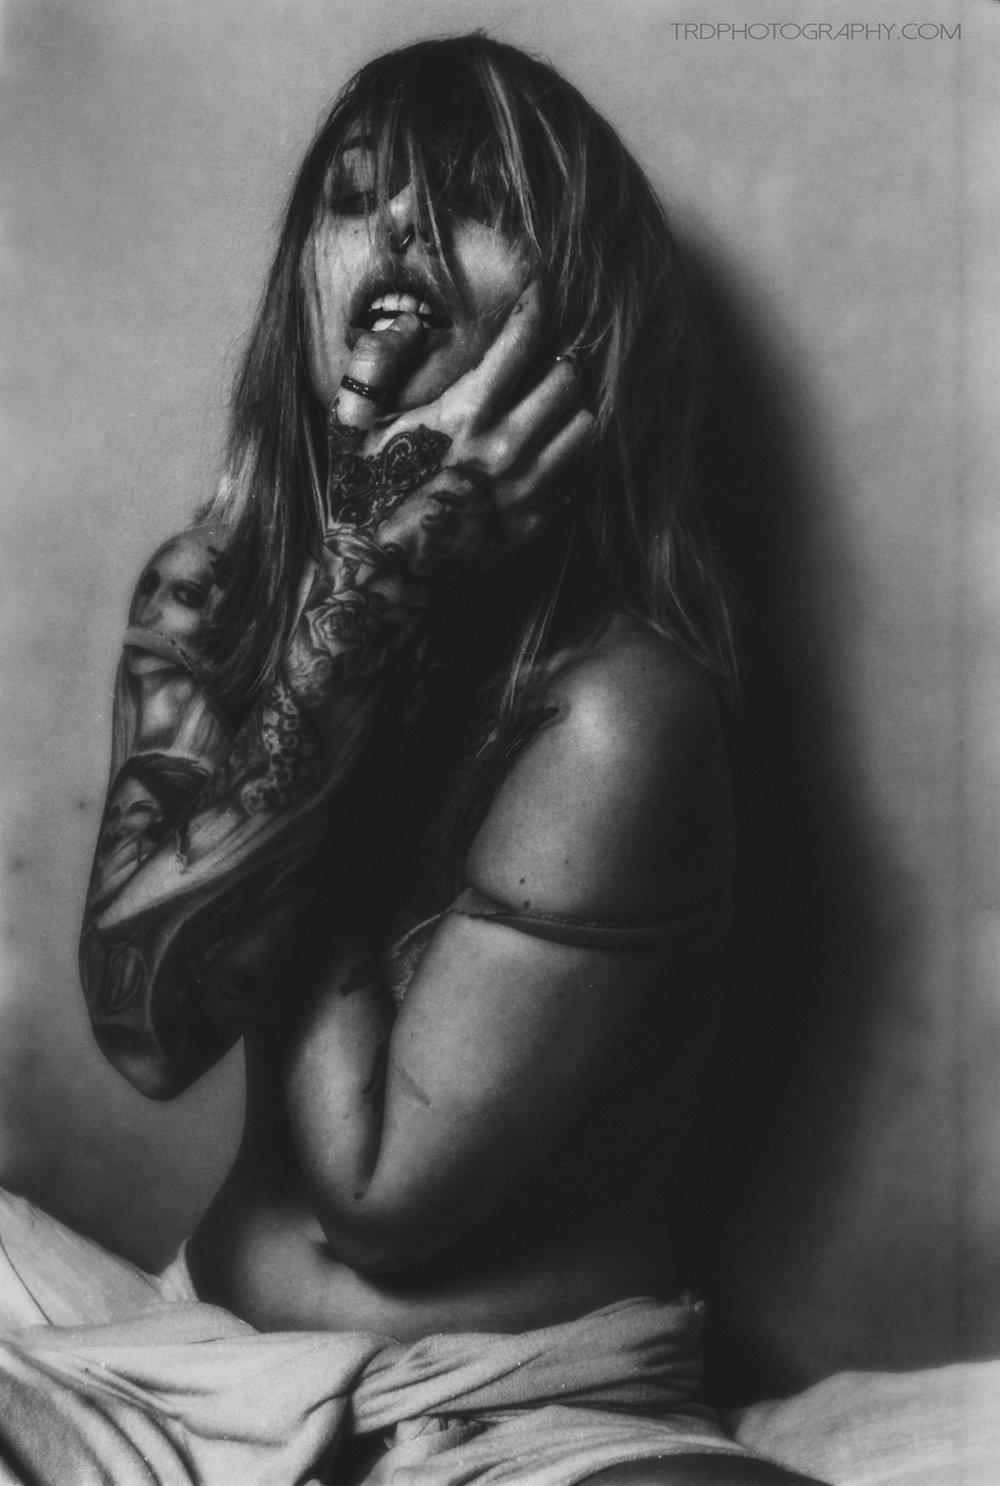 Amanda Pocalypse - TRD Photography - Kodak Tri X